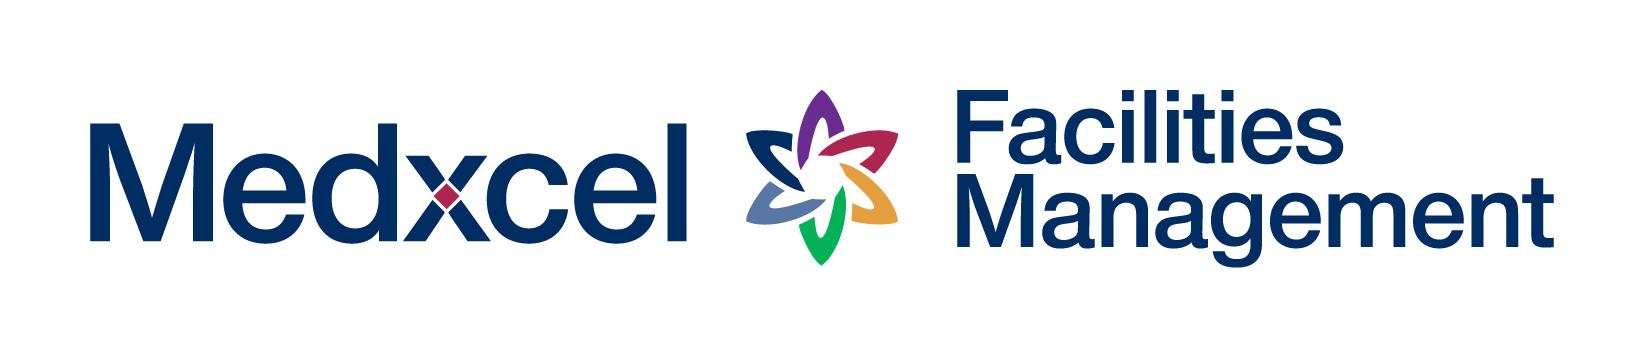 Medxcel FM Horizontal   RGB   300dpi (2) (1)